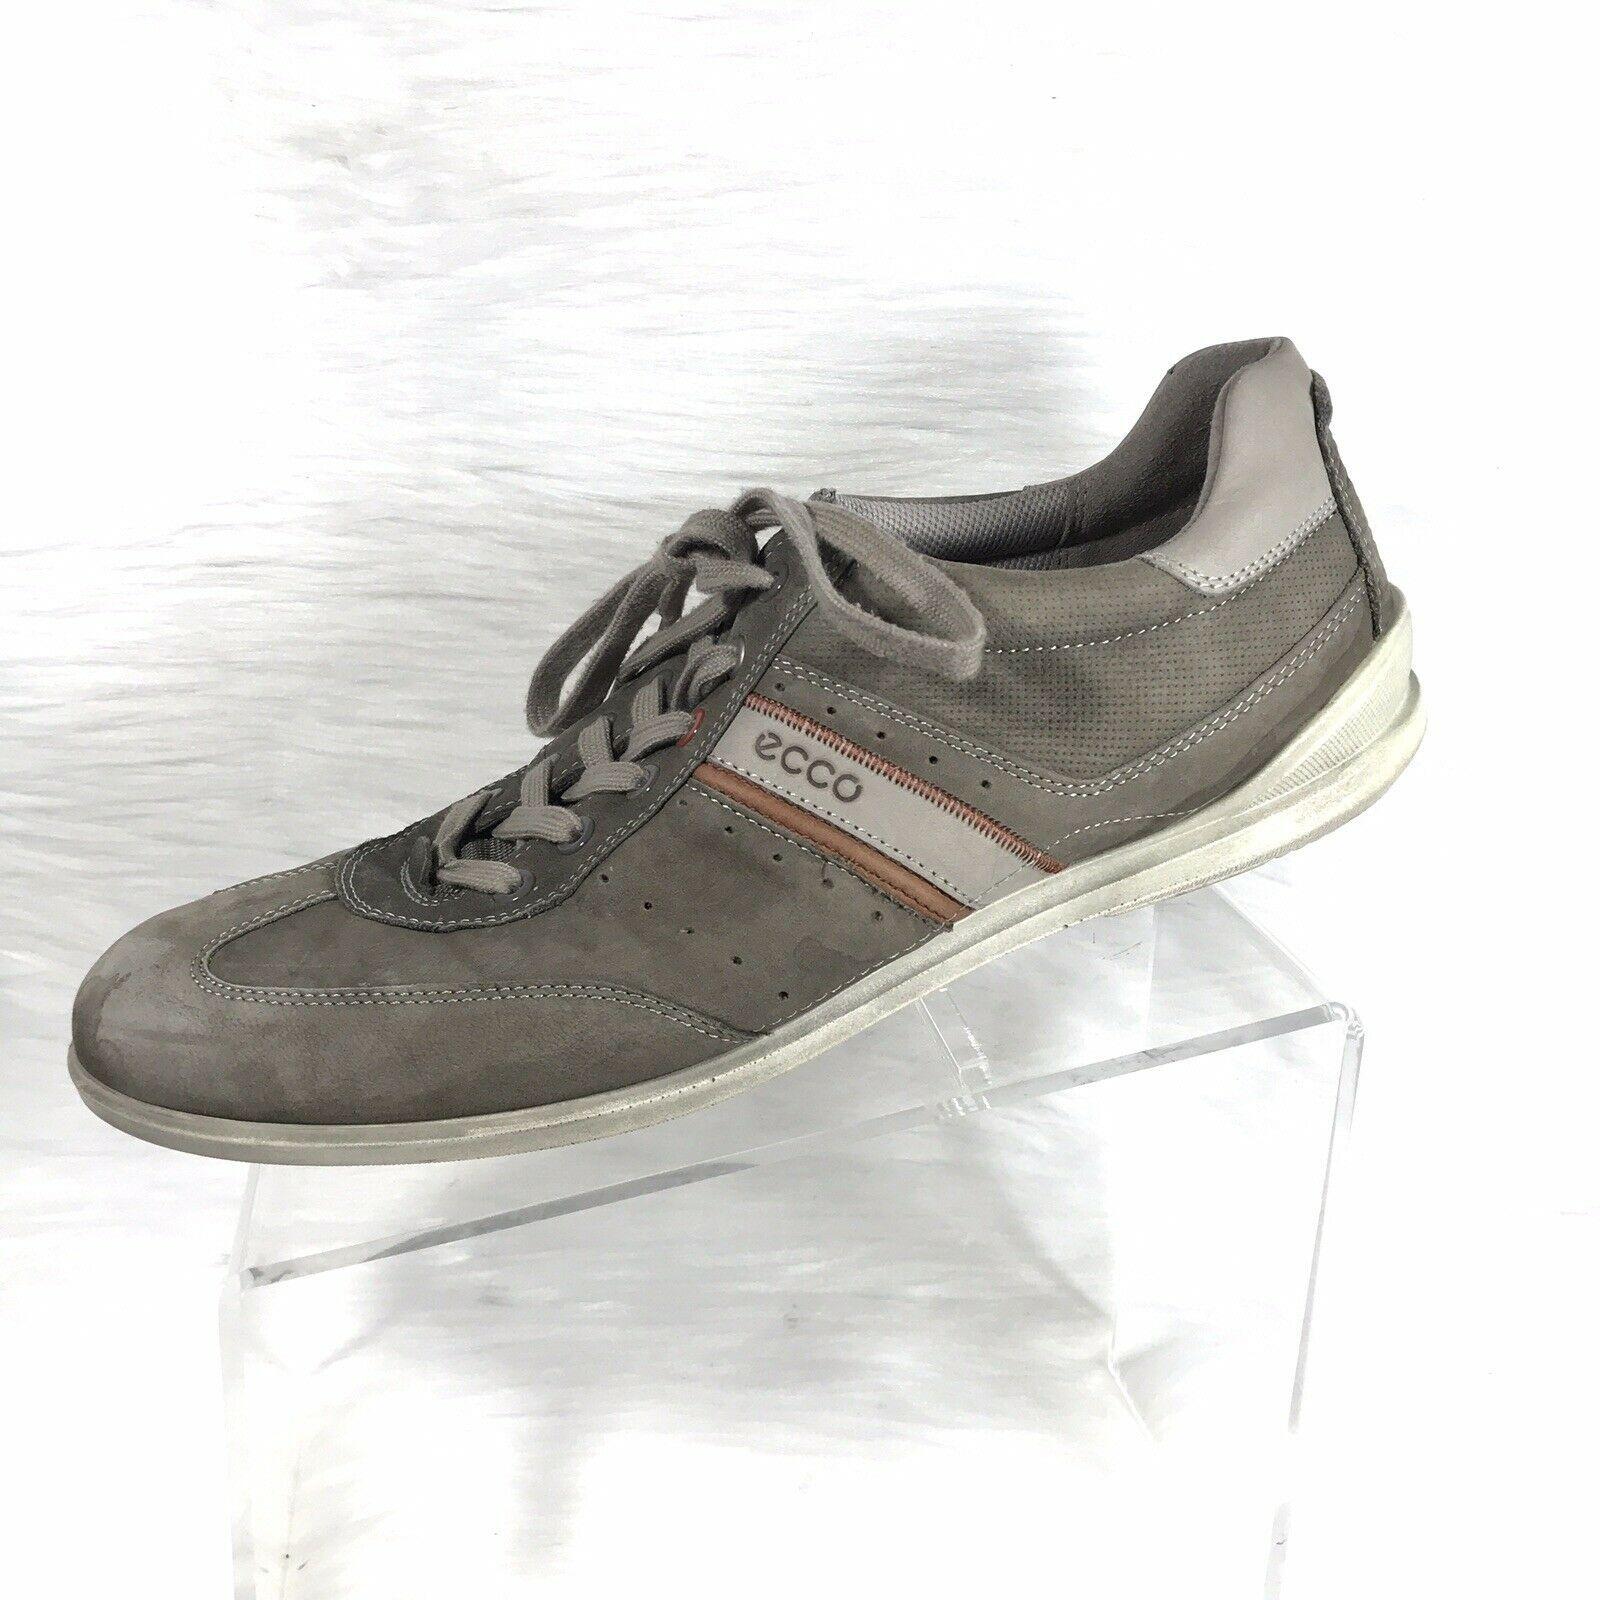 ECCO Mens Fashion Sneakers Gray Leather